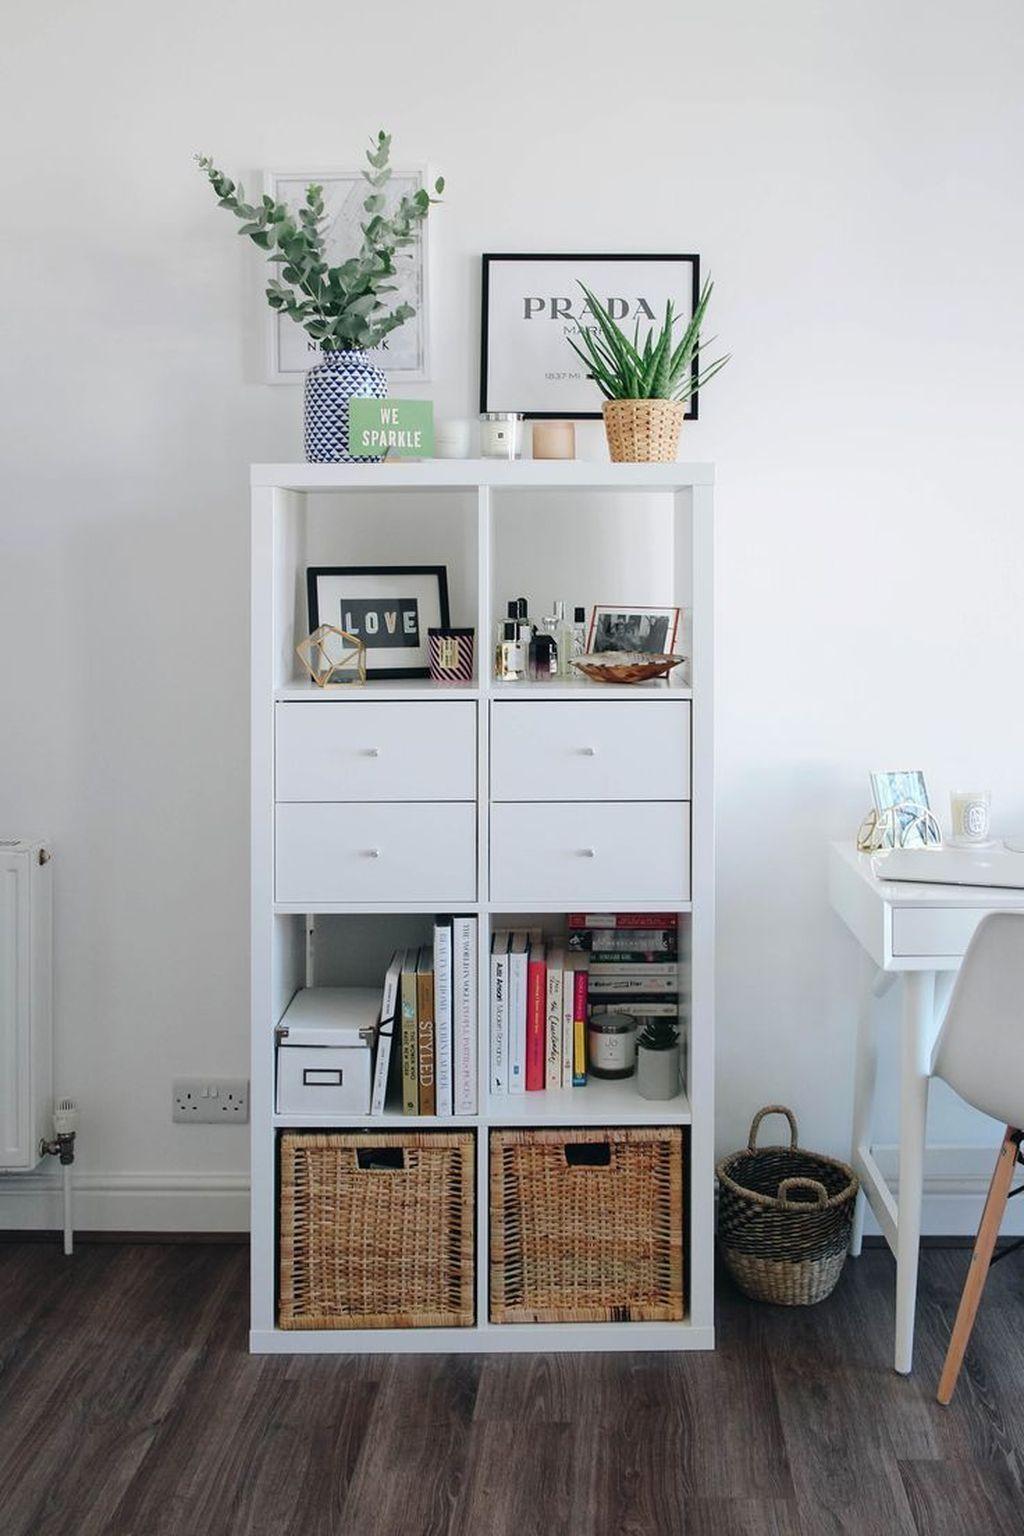 20 Unique Diy Small Apartment Decorating Ideas On A Budget